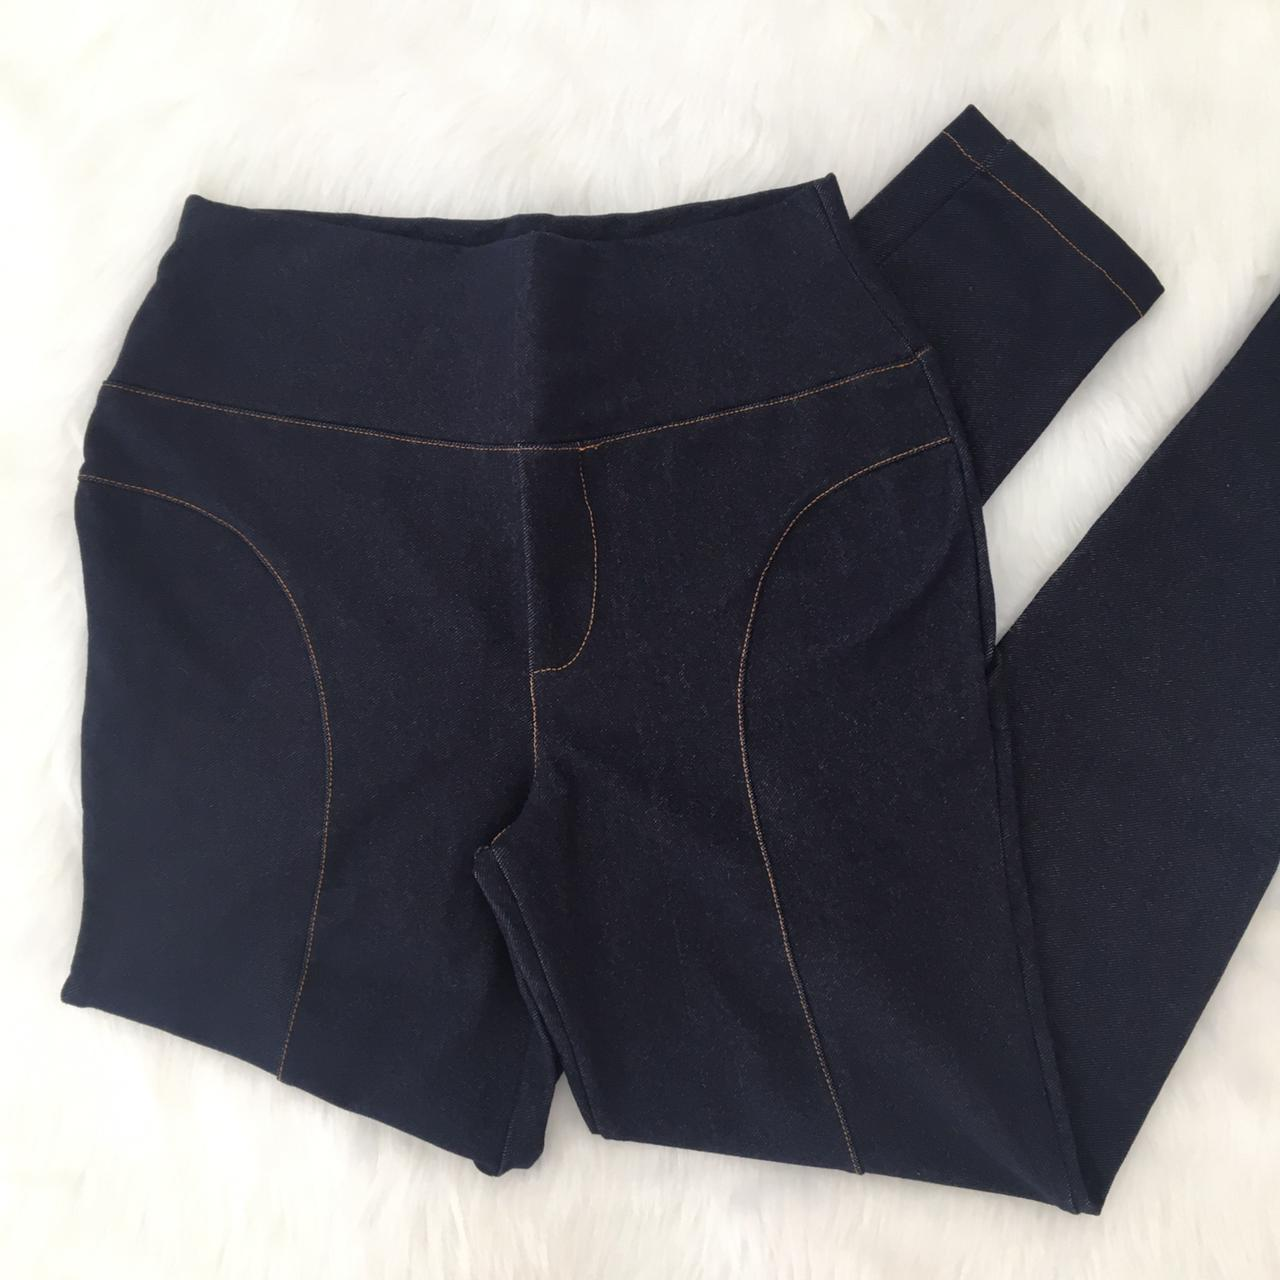 Ref 481 - Calça Montaria Jeans Strech